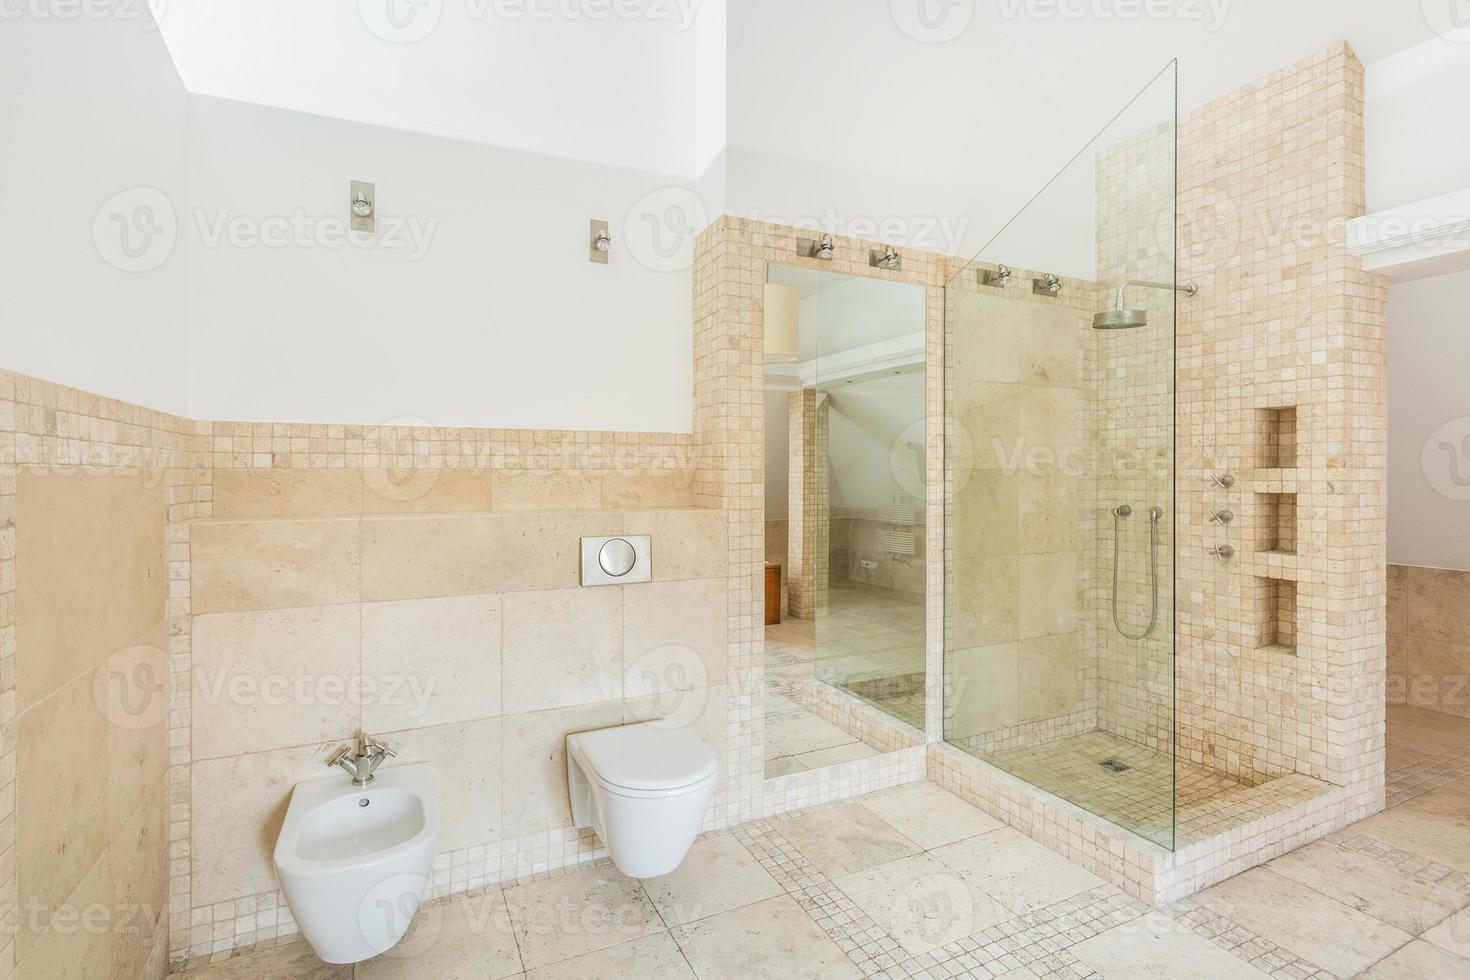 salle de bain carreaux de roche photo